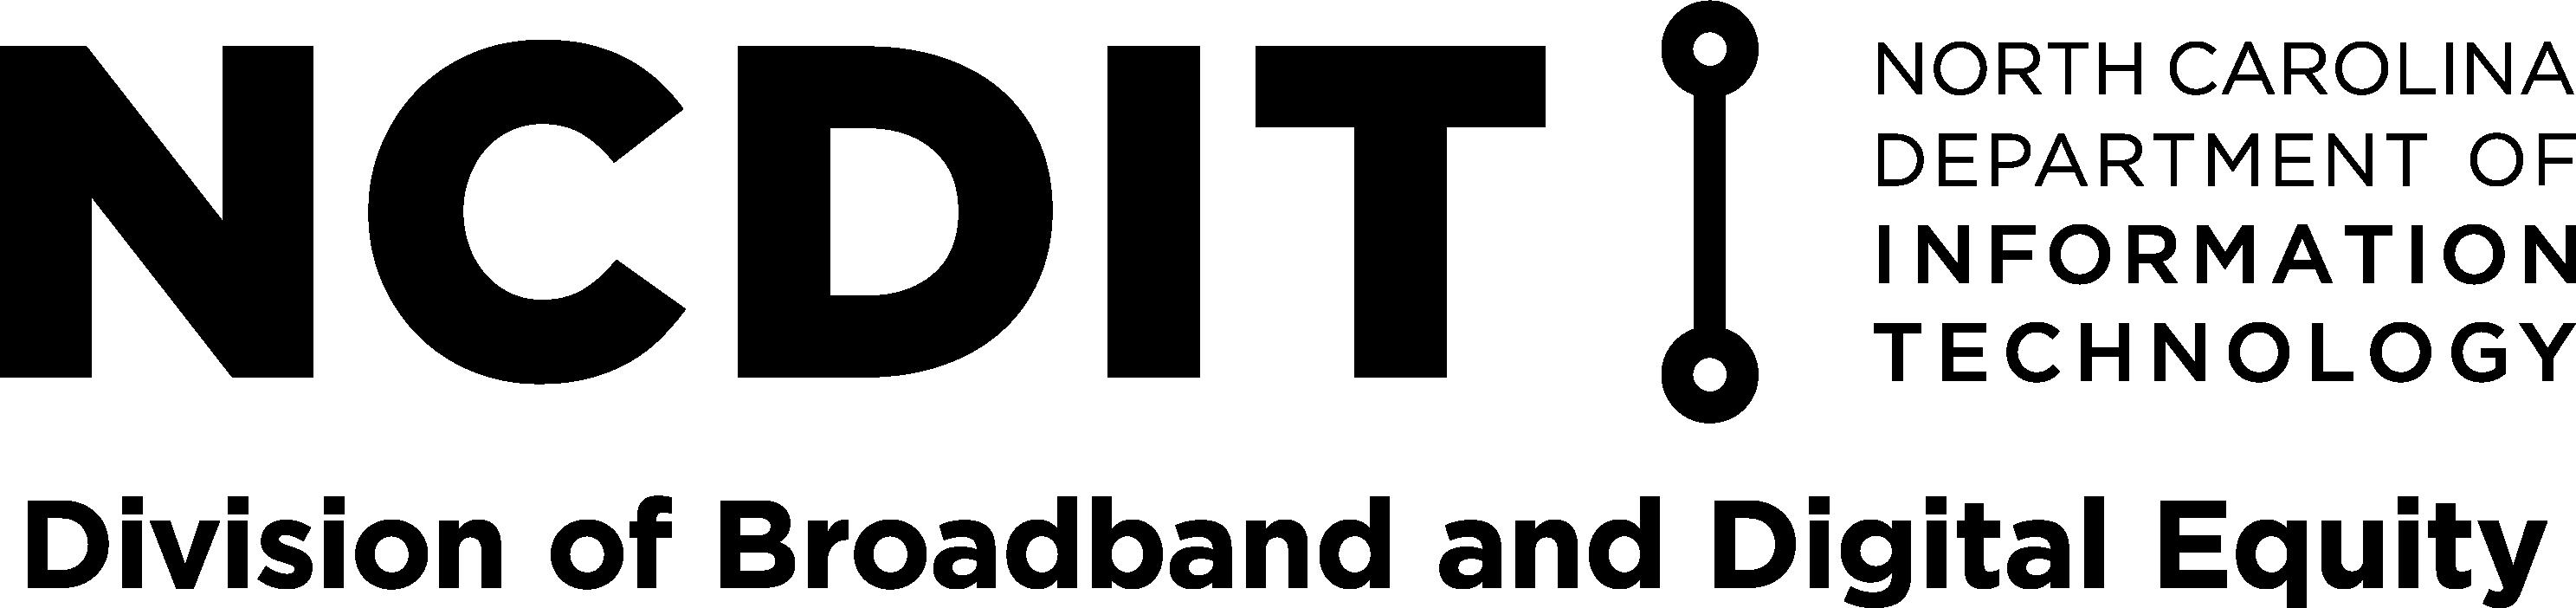 ncbroadband.gov logo